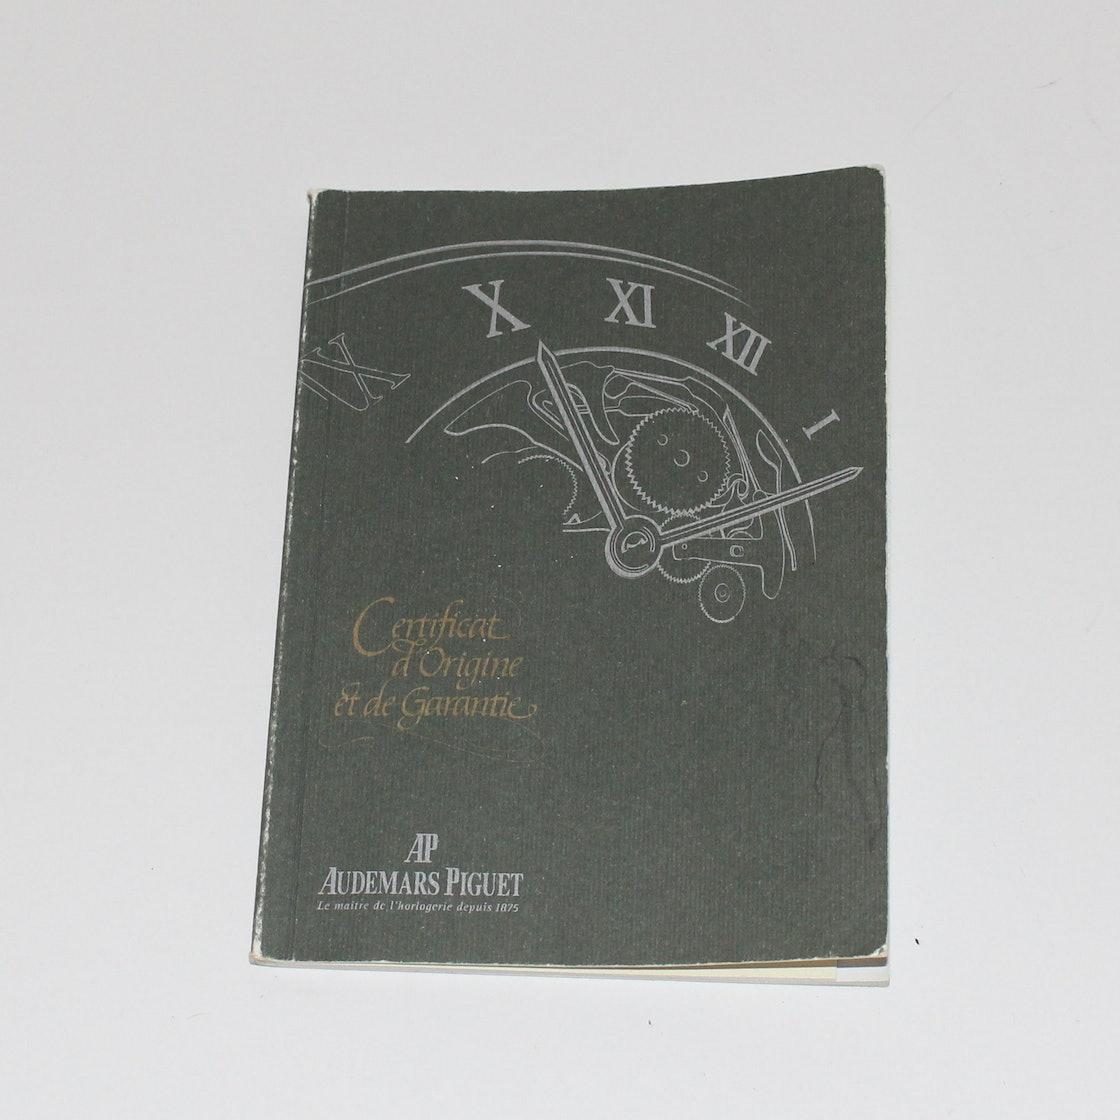 Audemars Piguet Royal Oak Chronograph 26022BC.OO.D002CR.01